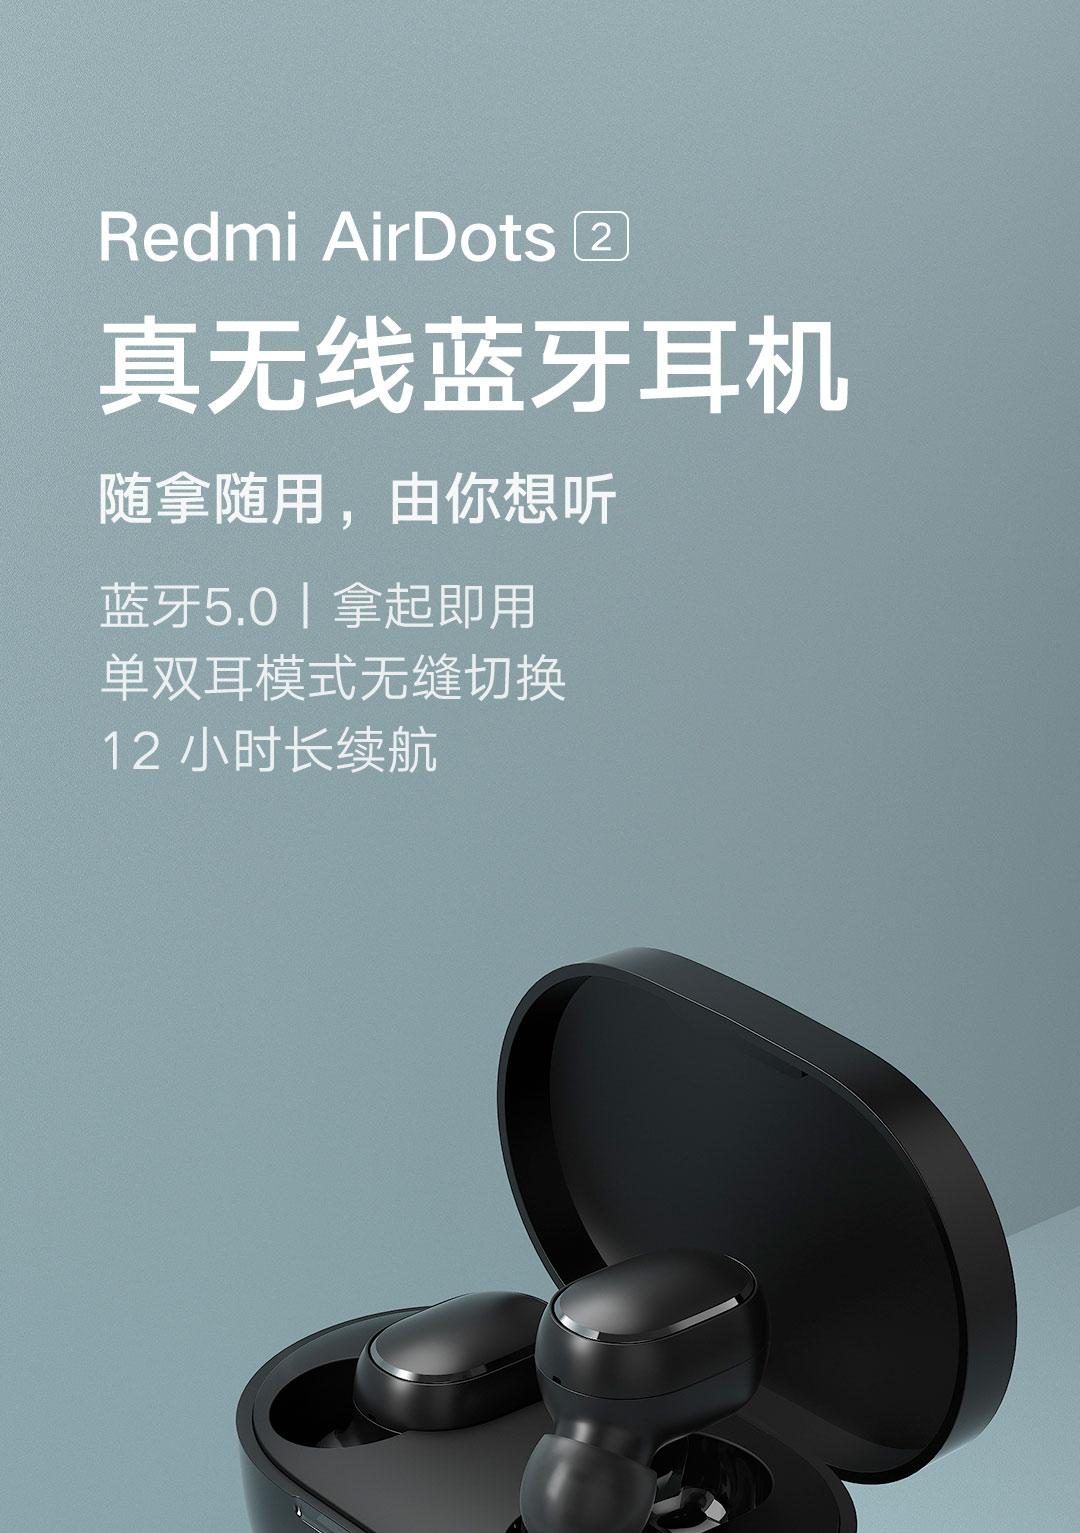 Redmi AirDots 2真无线蓝牙耳机